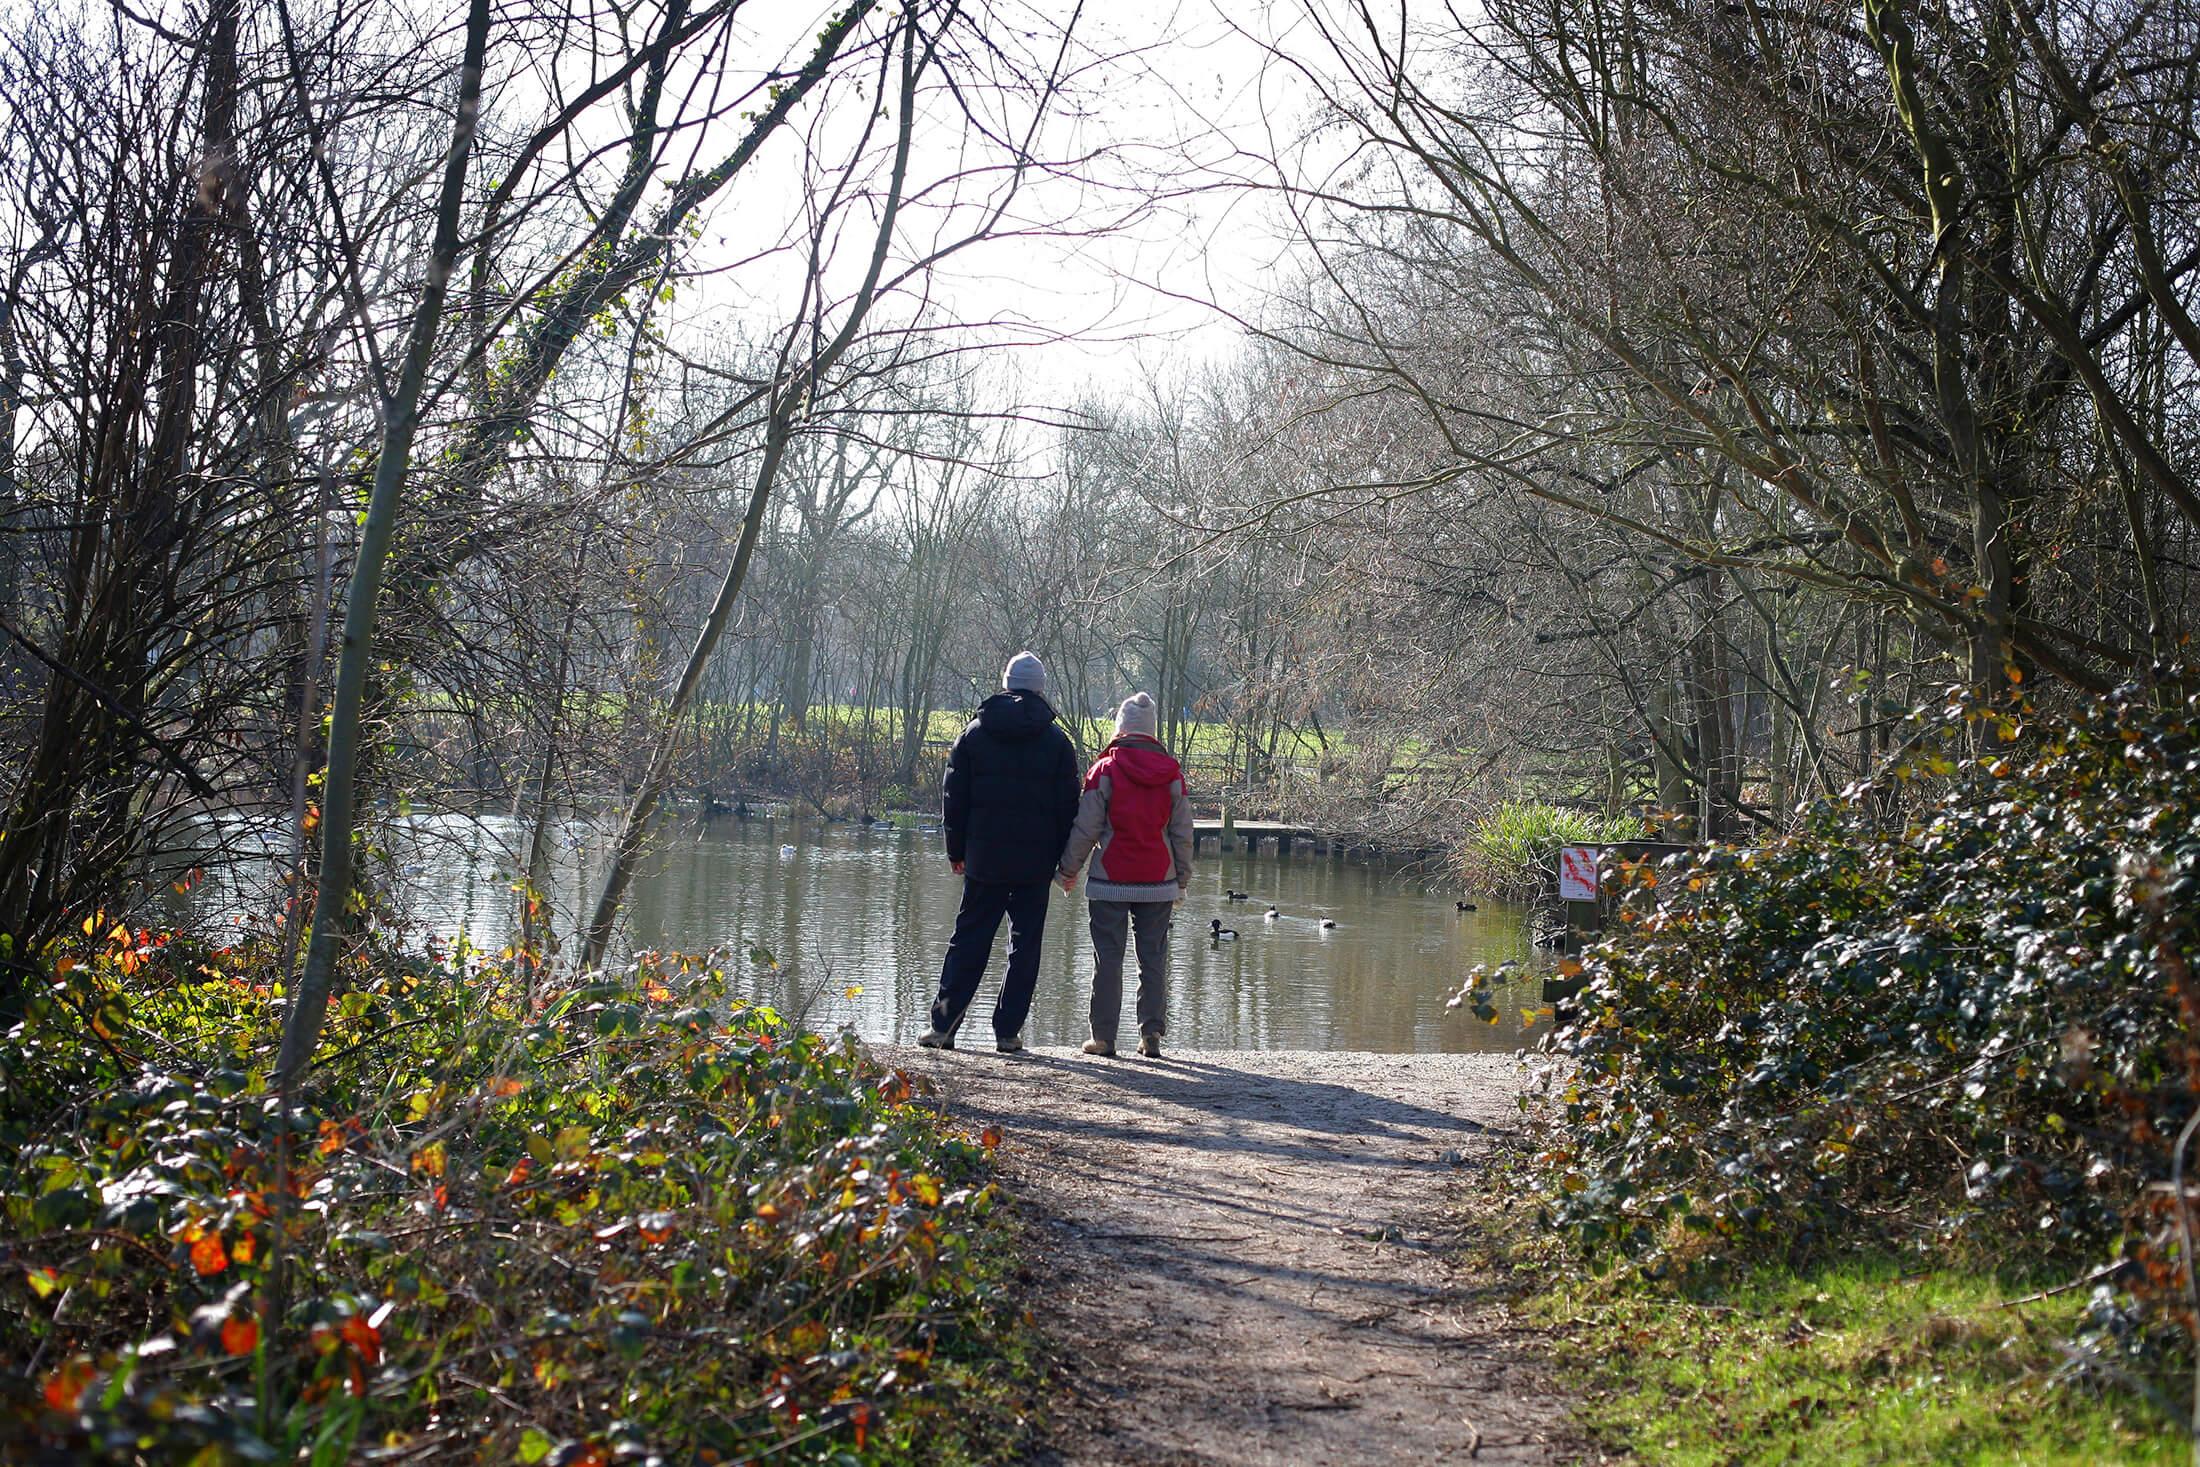 Enjoy Wandsworth Common